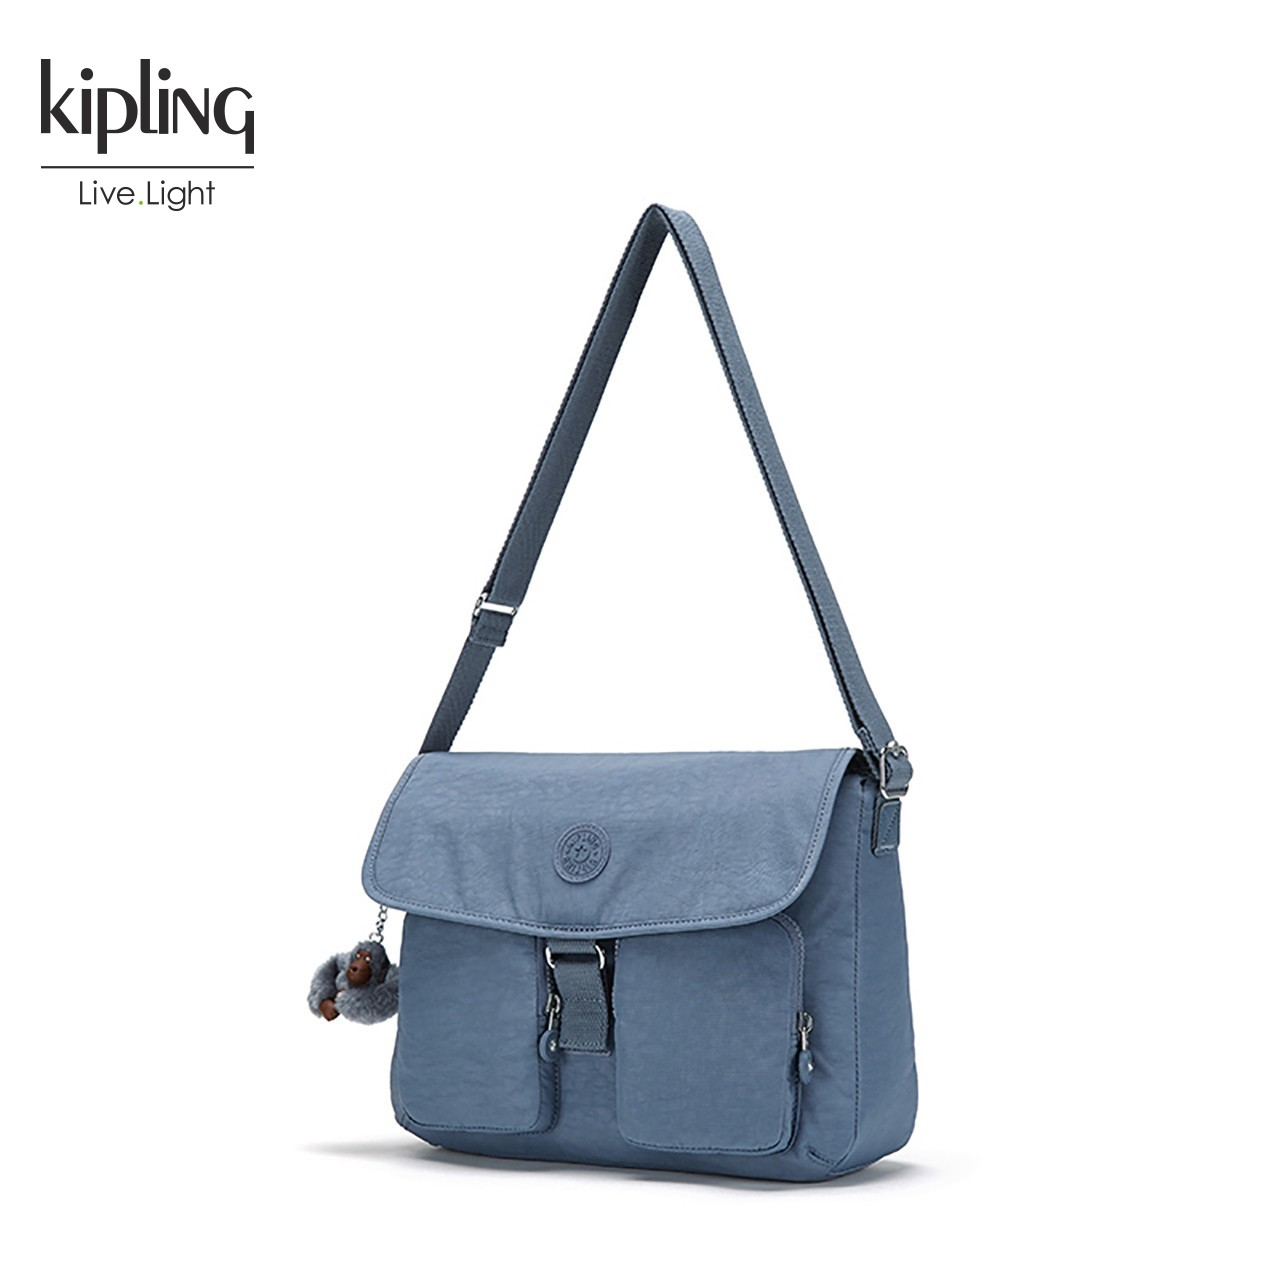 Kipling凯浦林2018新款简约单肩包K13698休闲女包斜挎包